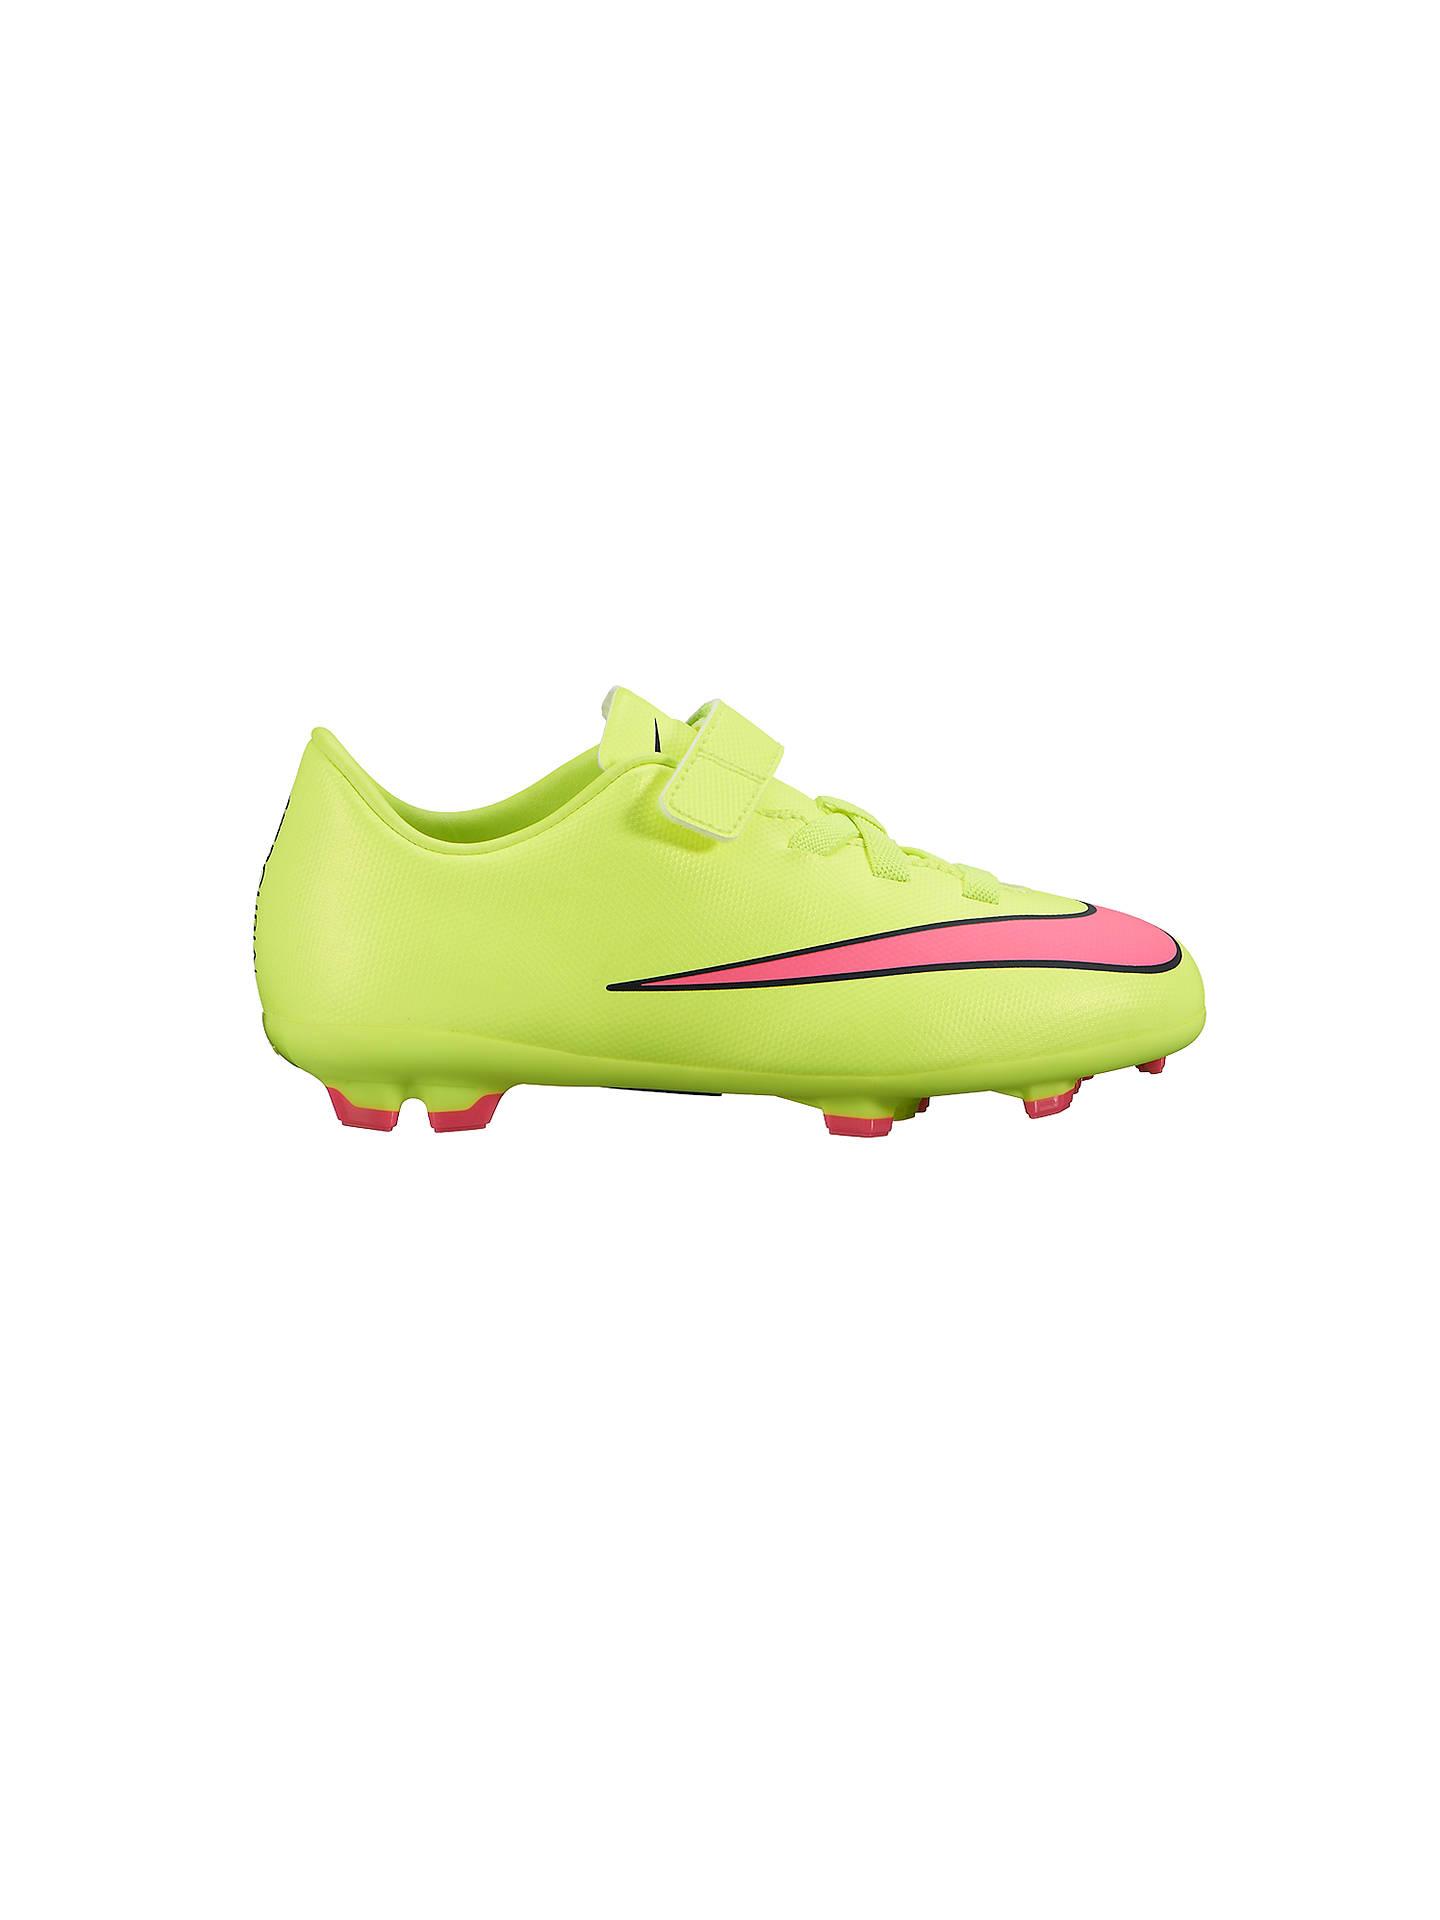 390ecd3975b5 ... Buy Nike Mercurial Victory V Firm Ground Football Boots, Neon Green, 10  Jnr Online ...